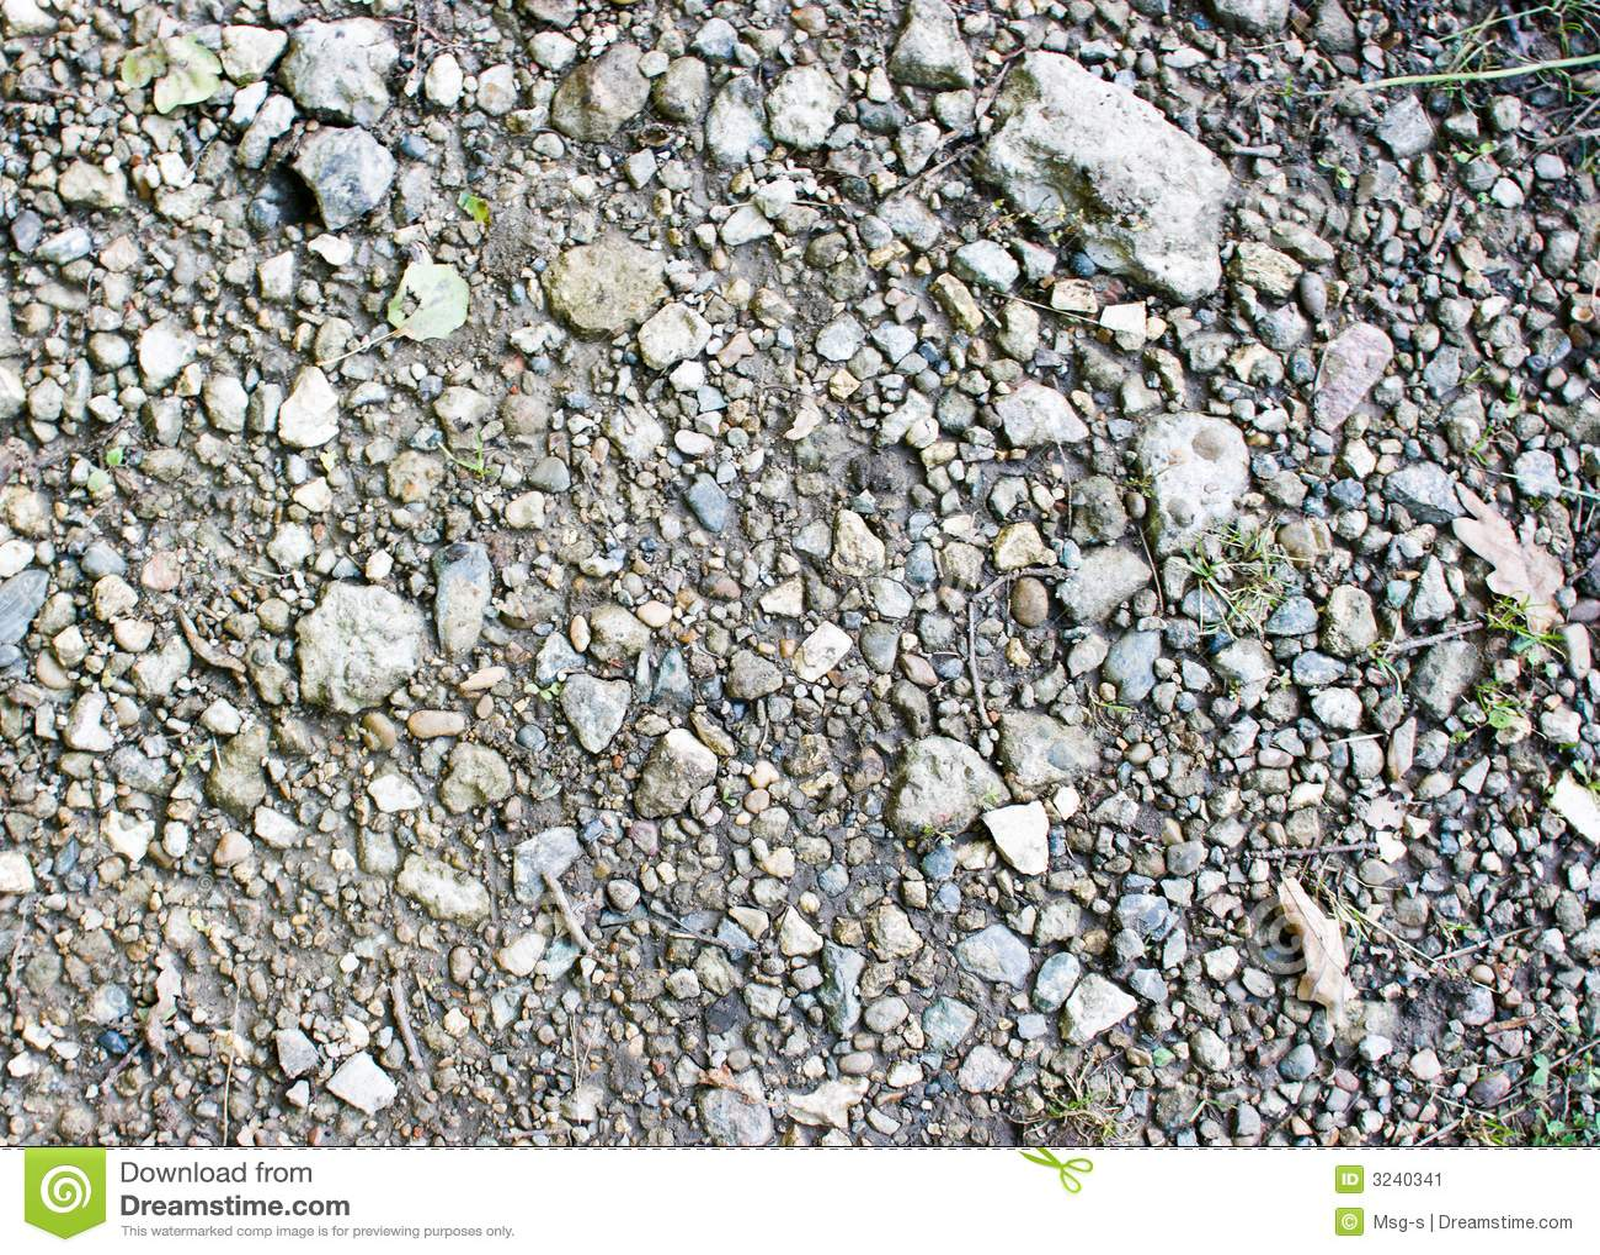 Stony ground stock image image of ground pebble stony for Suelo pedregoso